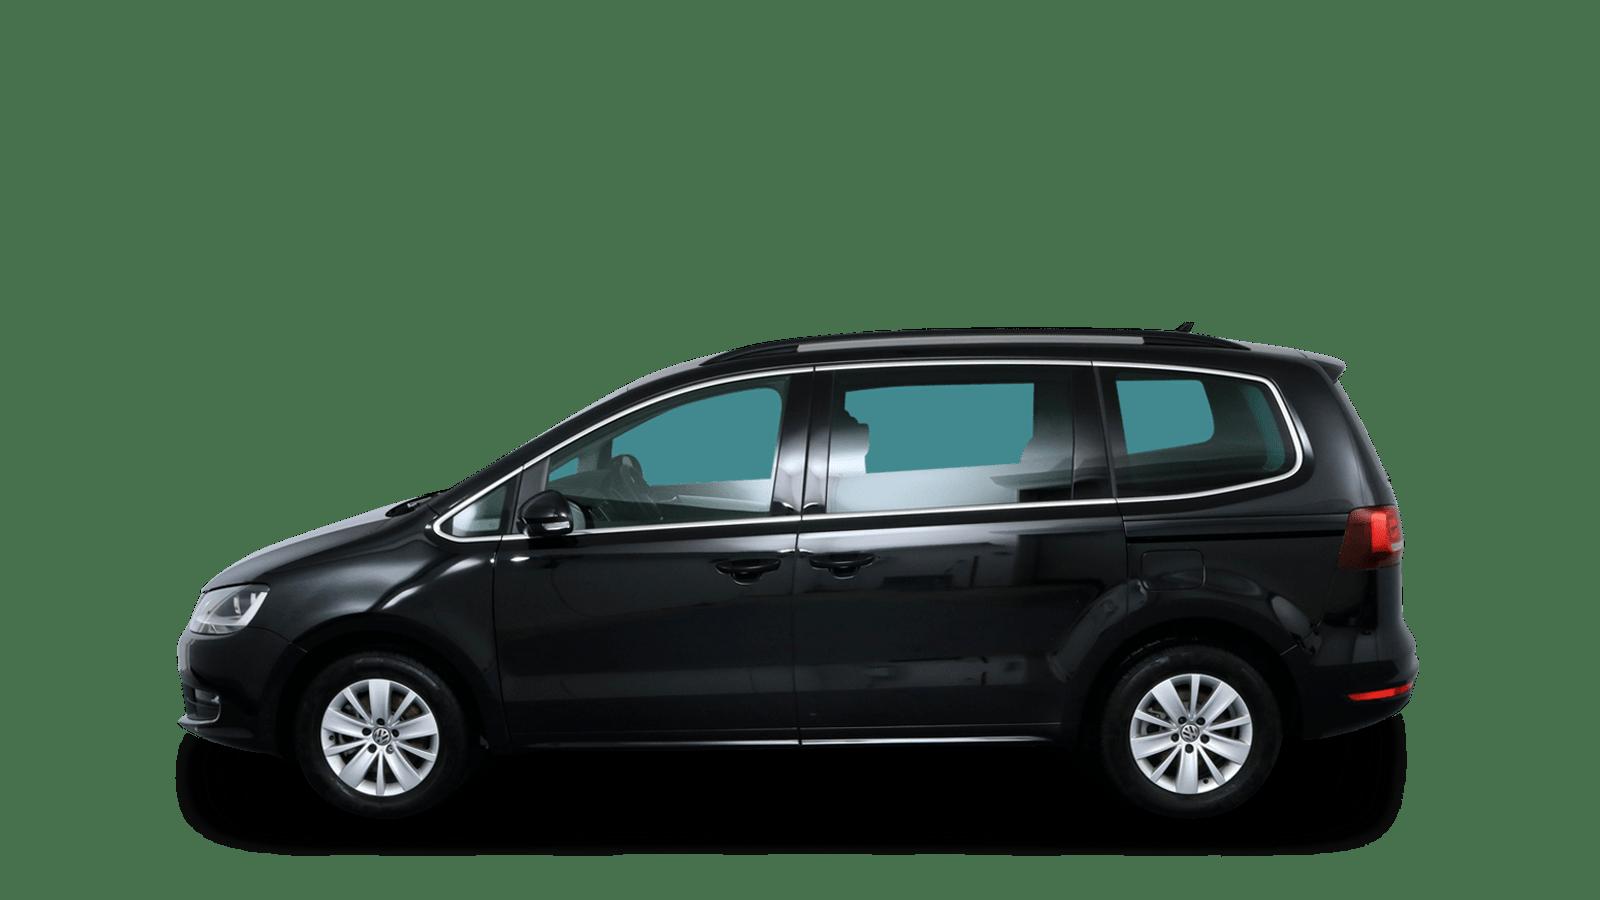 VW Sharan Black back - Clyde car subscription